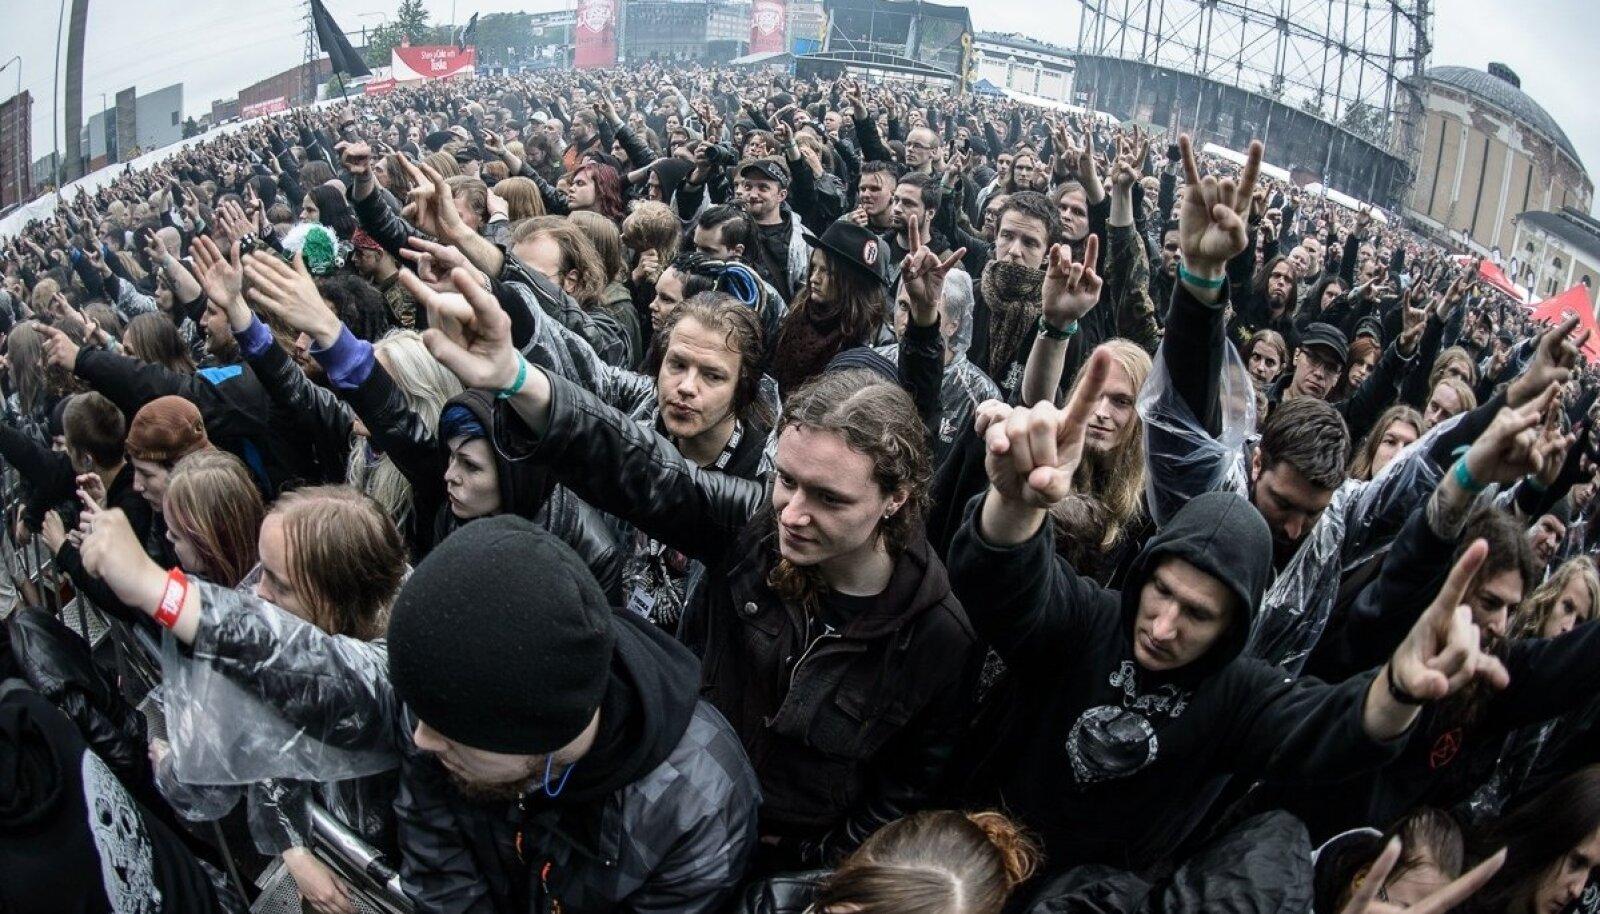 Tuska Open Air Metal Festival 2014